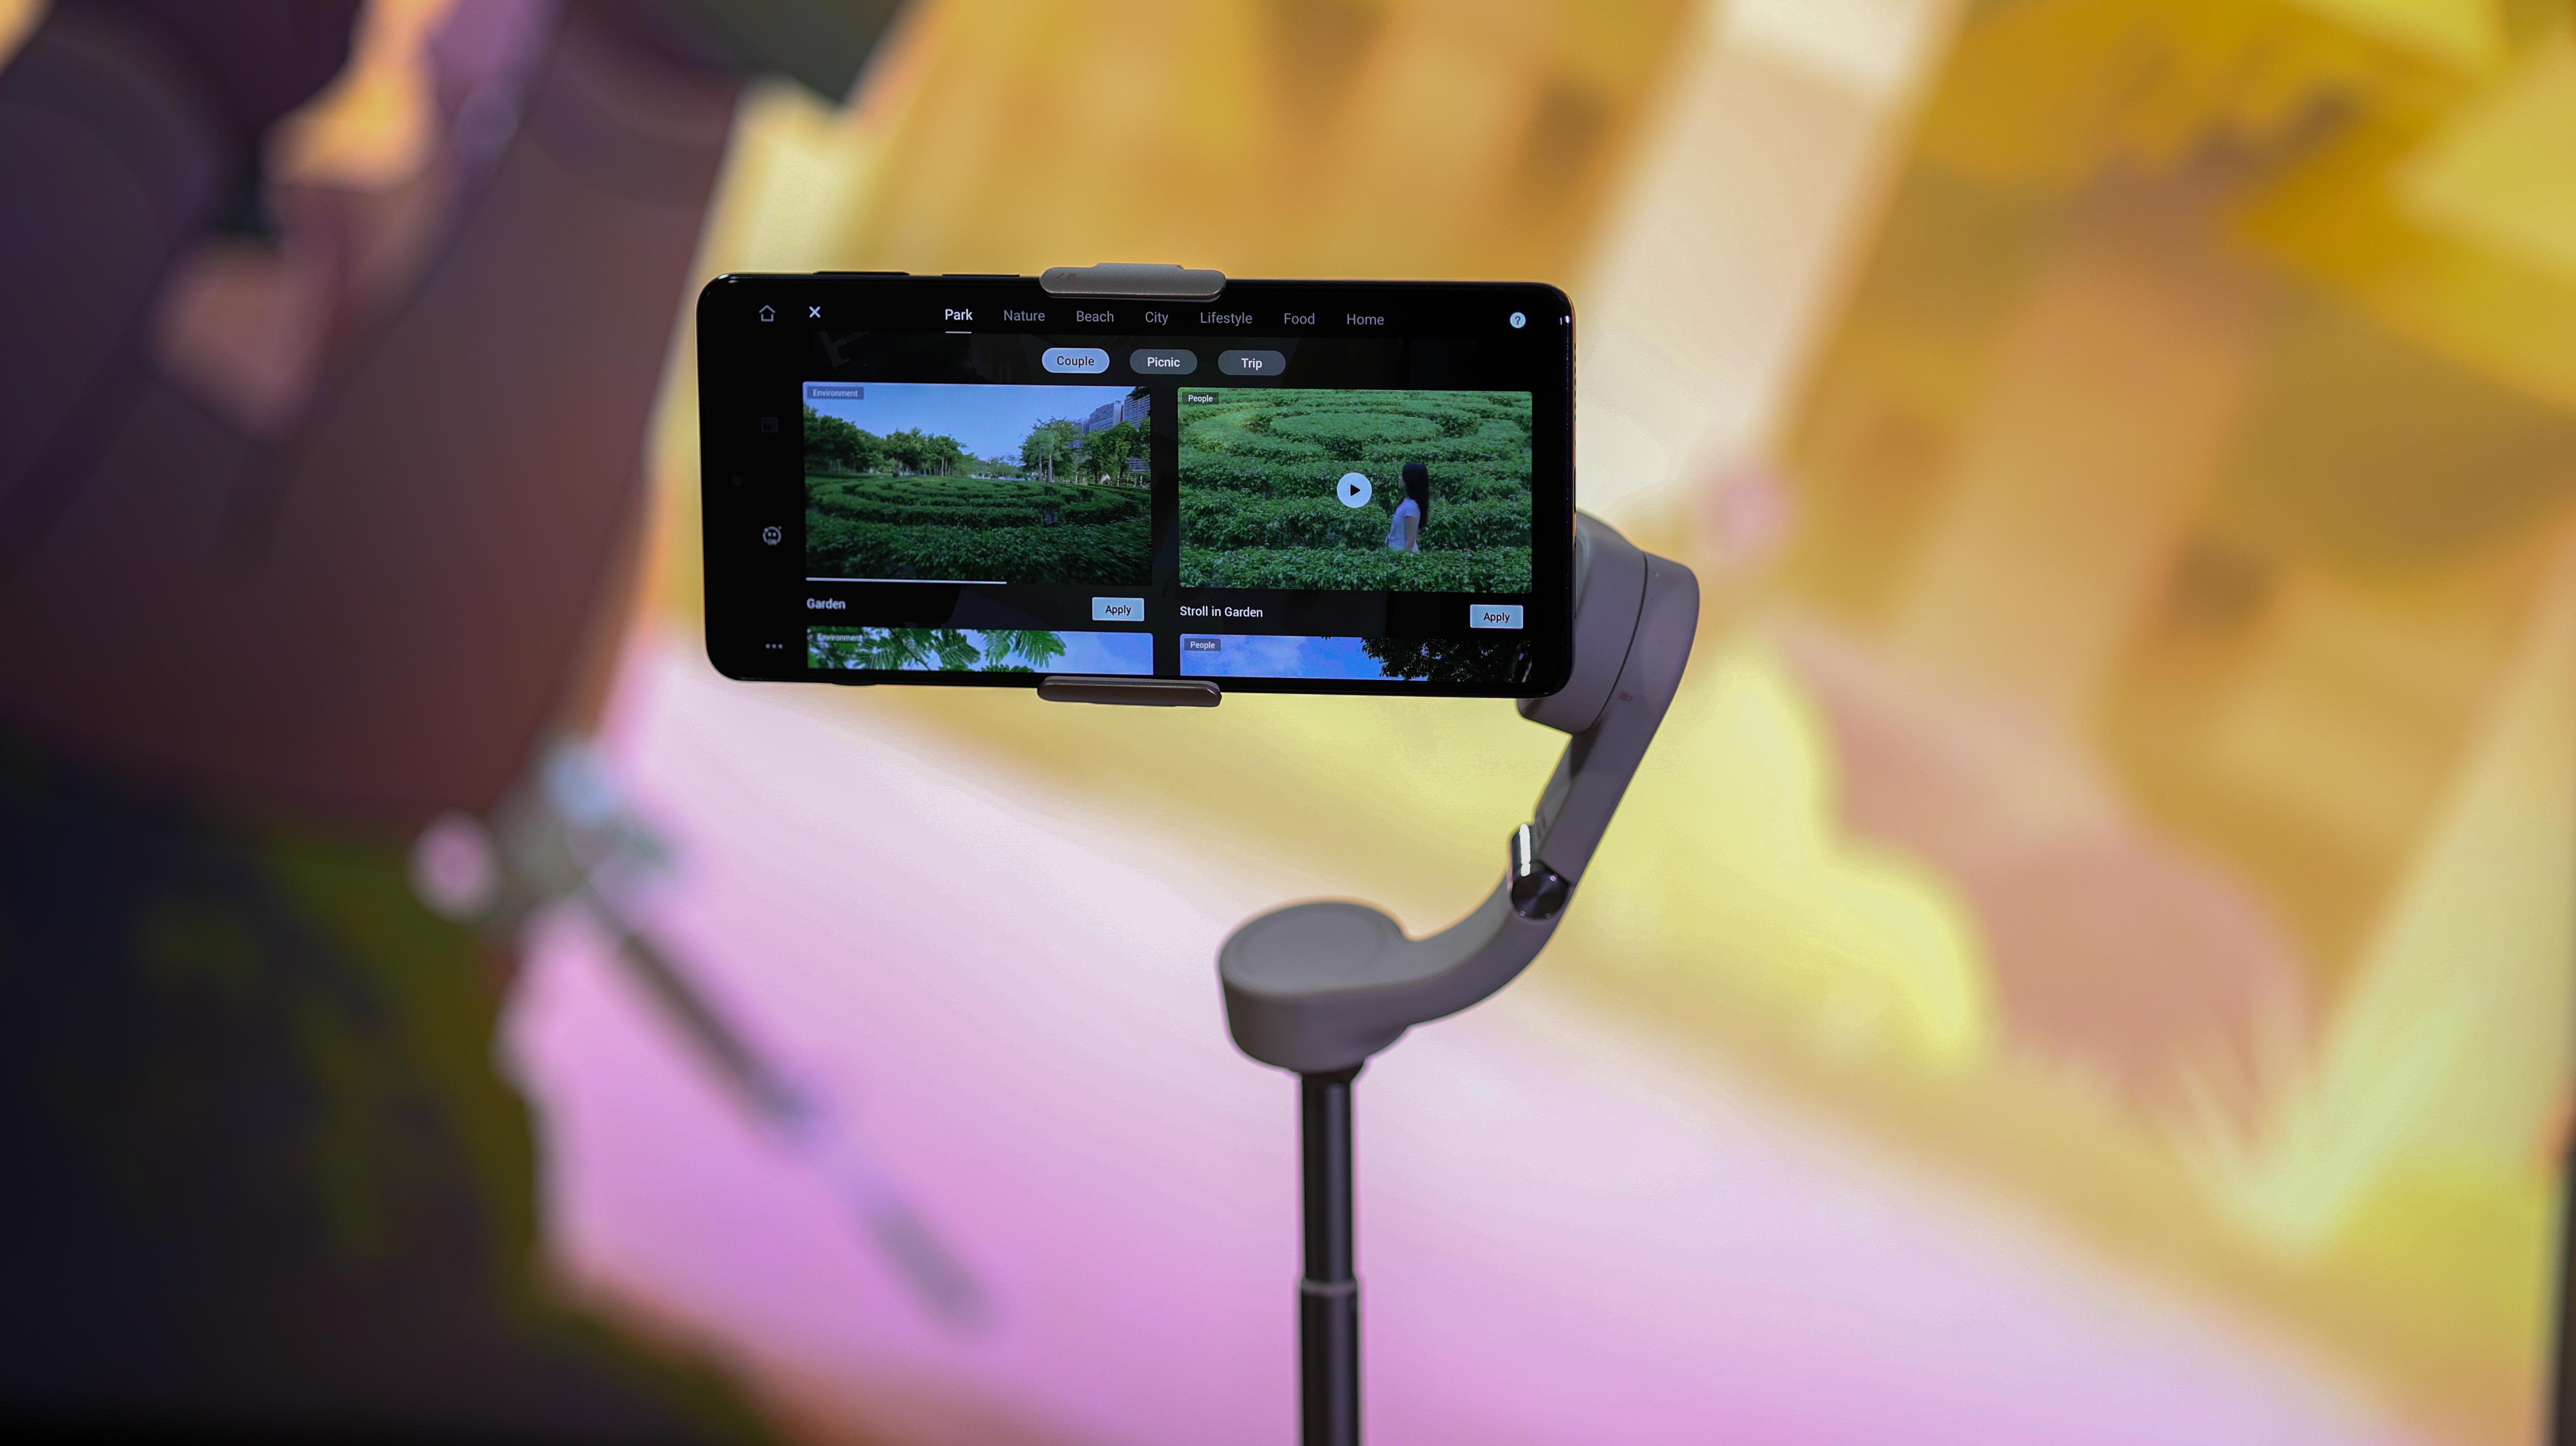 A phone mounted on the DJI OM 5 phone gimbal